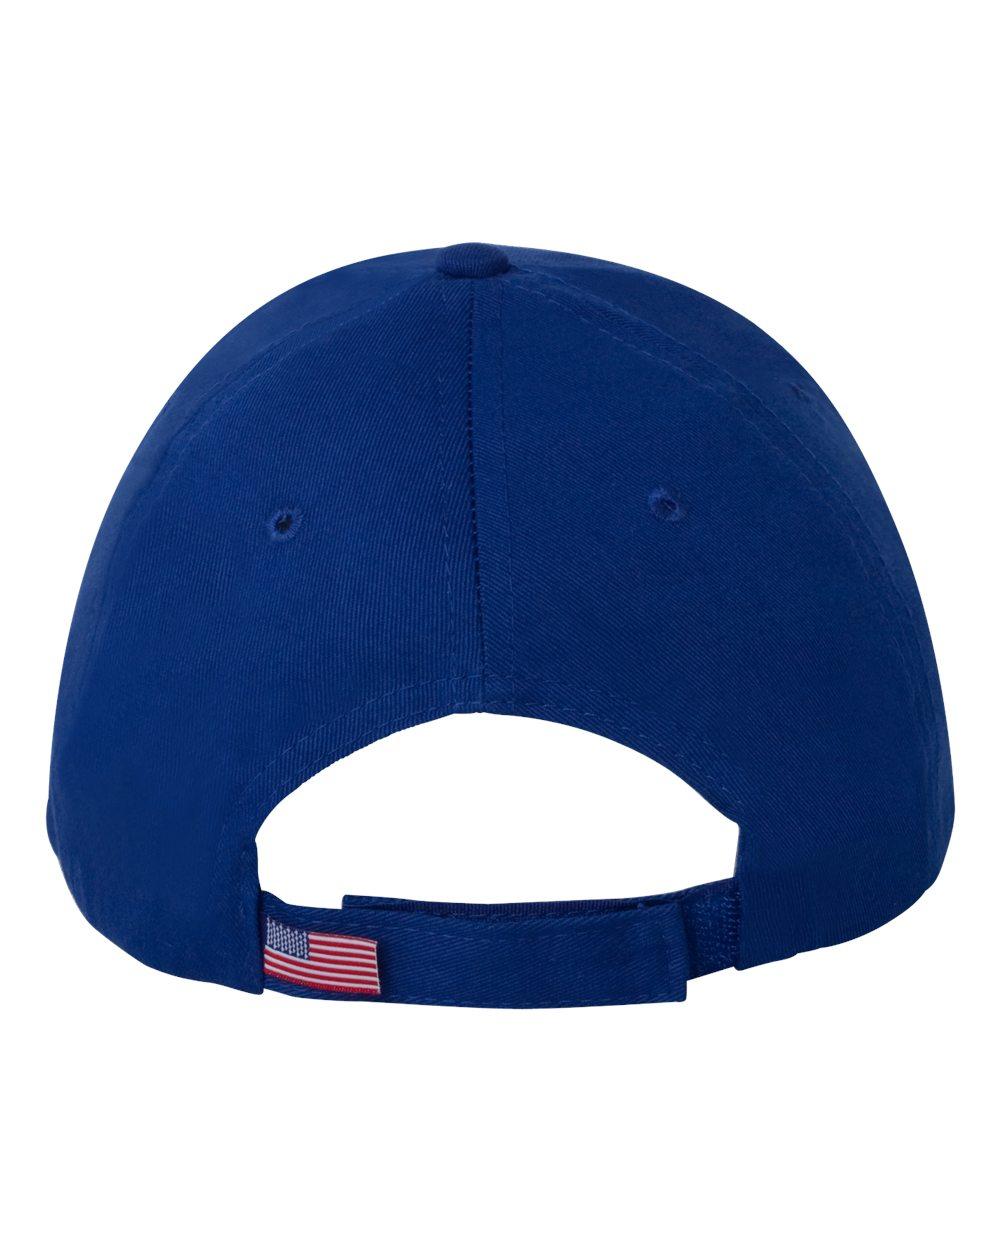 Bayside-Mens-Baseball-USA-Made-Structured-Cap-Hat-3660-six-panel-mid-profile thumbnail 13